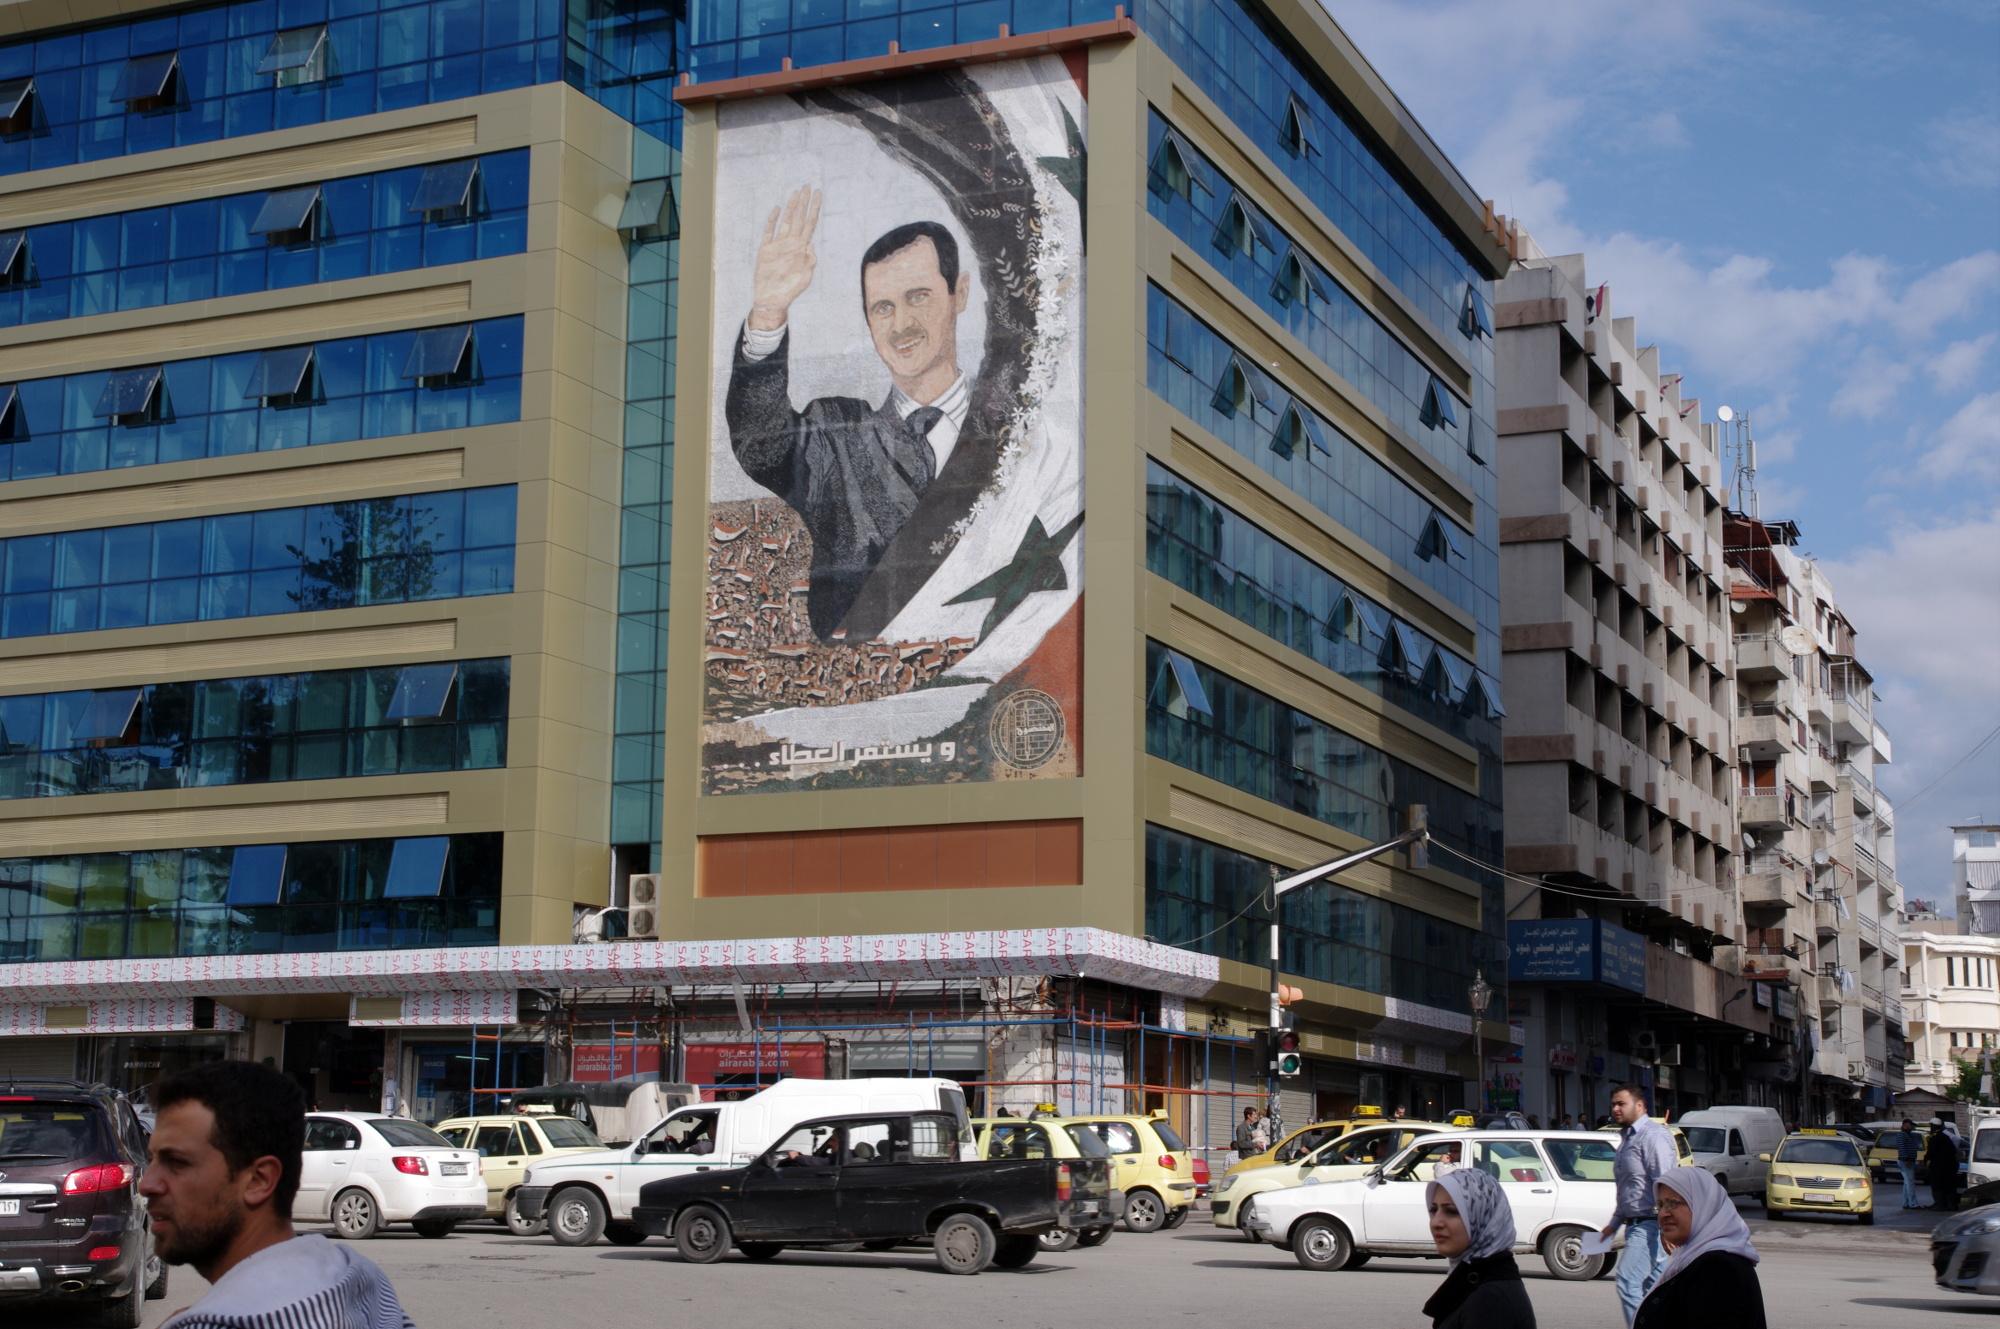 A mural of Bashar al-Assad in the port city of Latakia, Syria ( source )